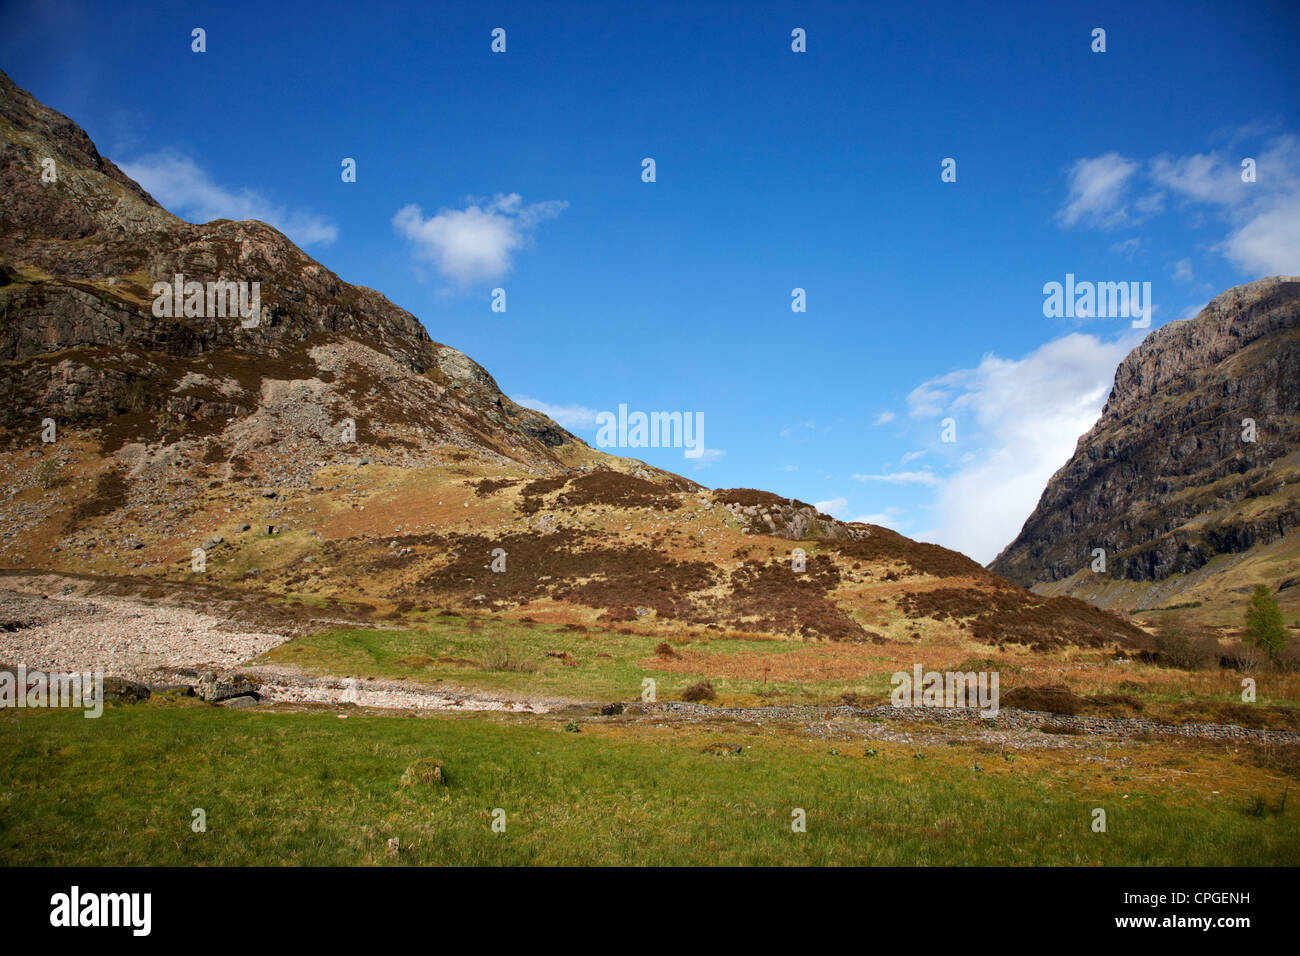 the clachaig gully lower edge at aonach eagach at the entrance to Glencoe highlands scotland uk - Stock Image